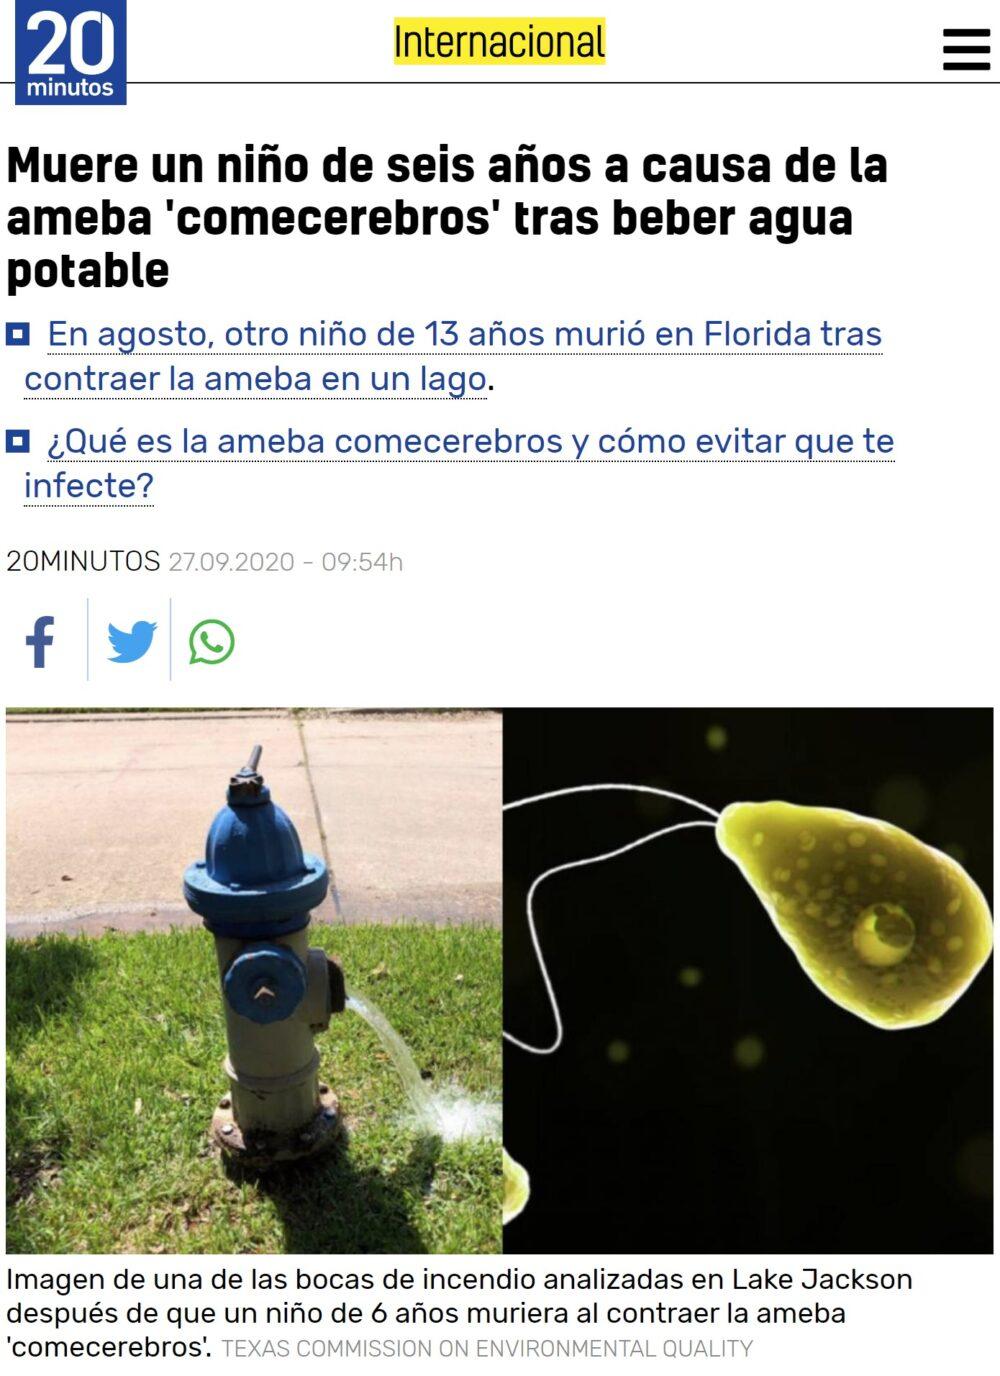 2020 no da tregua: Descubren que el agua del lago Jackson (Tejas) está infectado por amebas comecerebros.